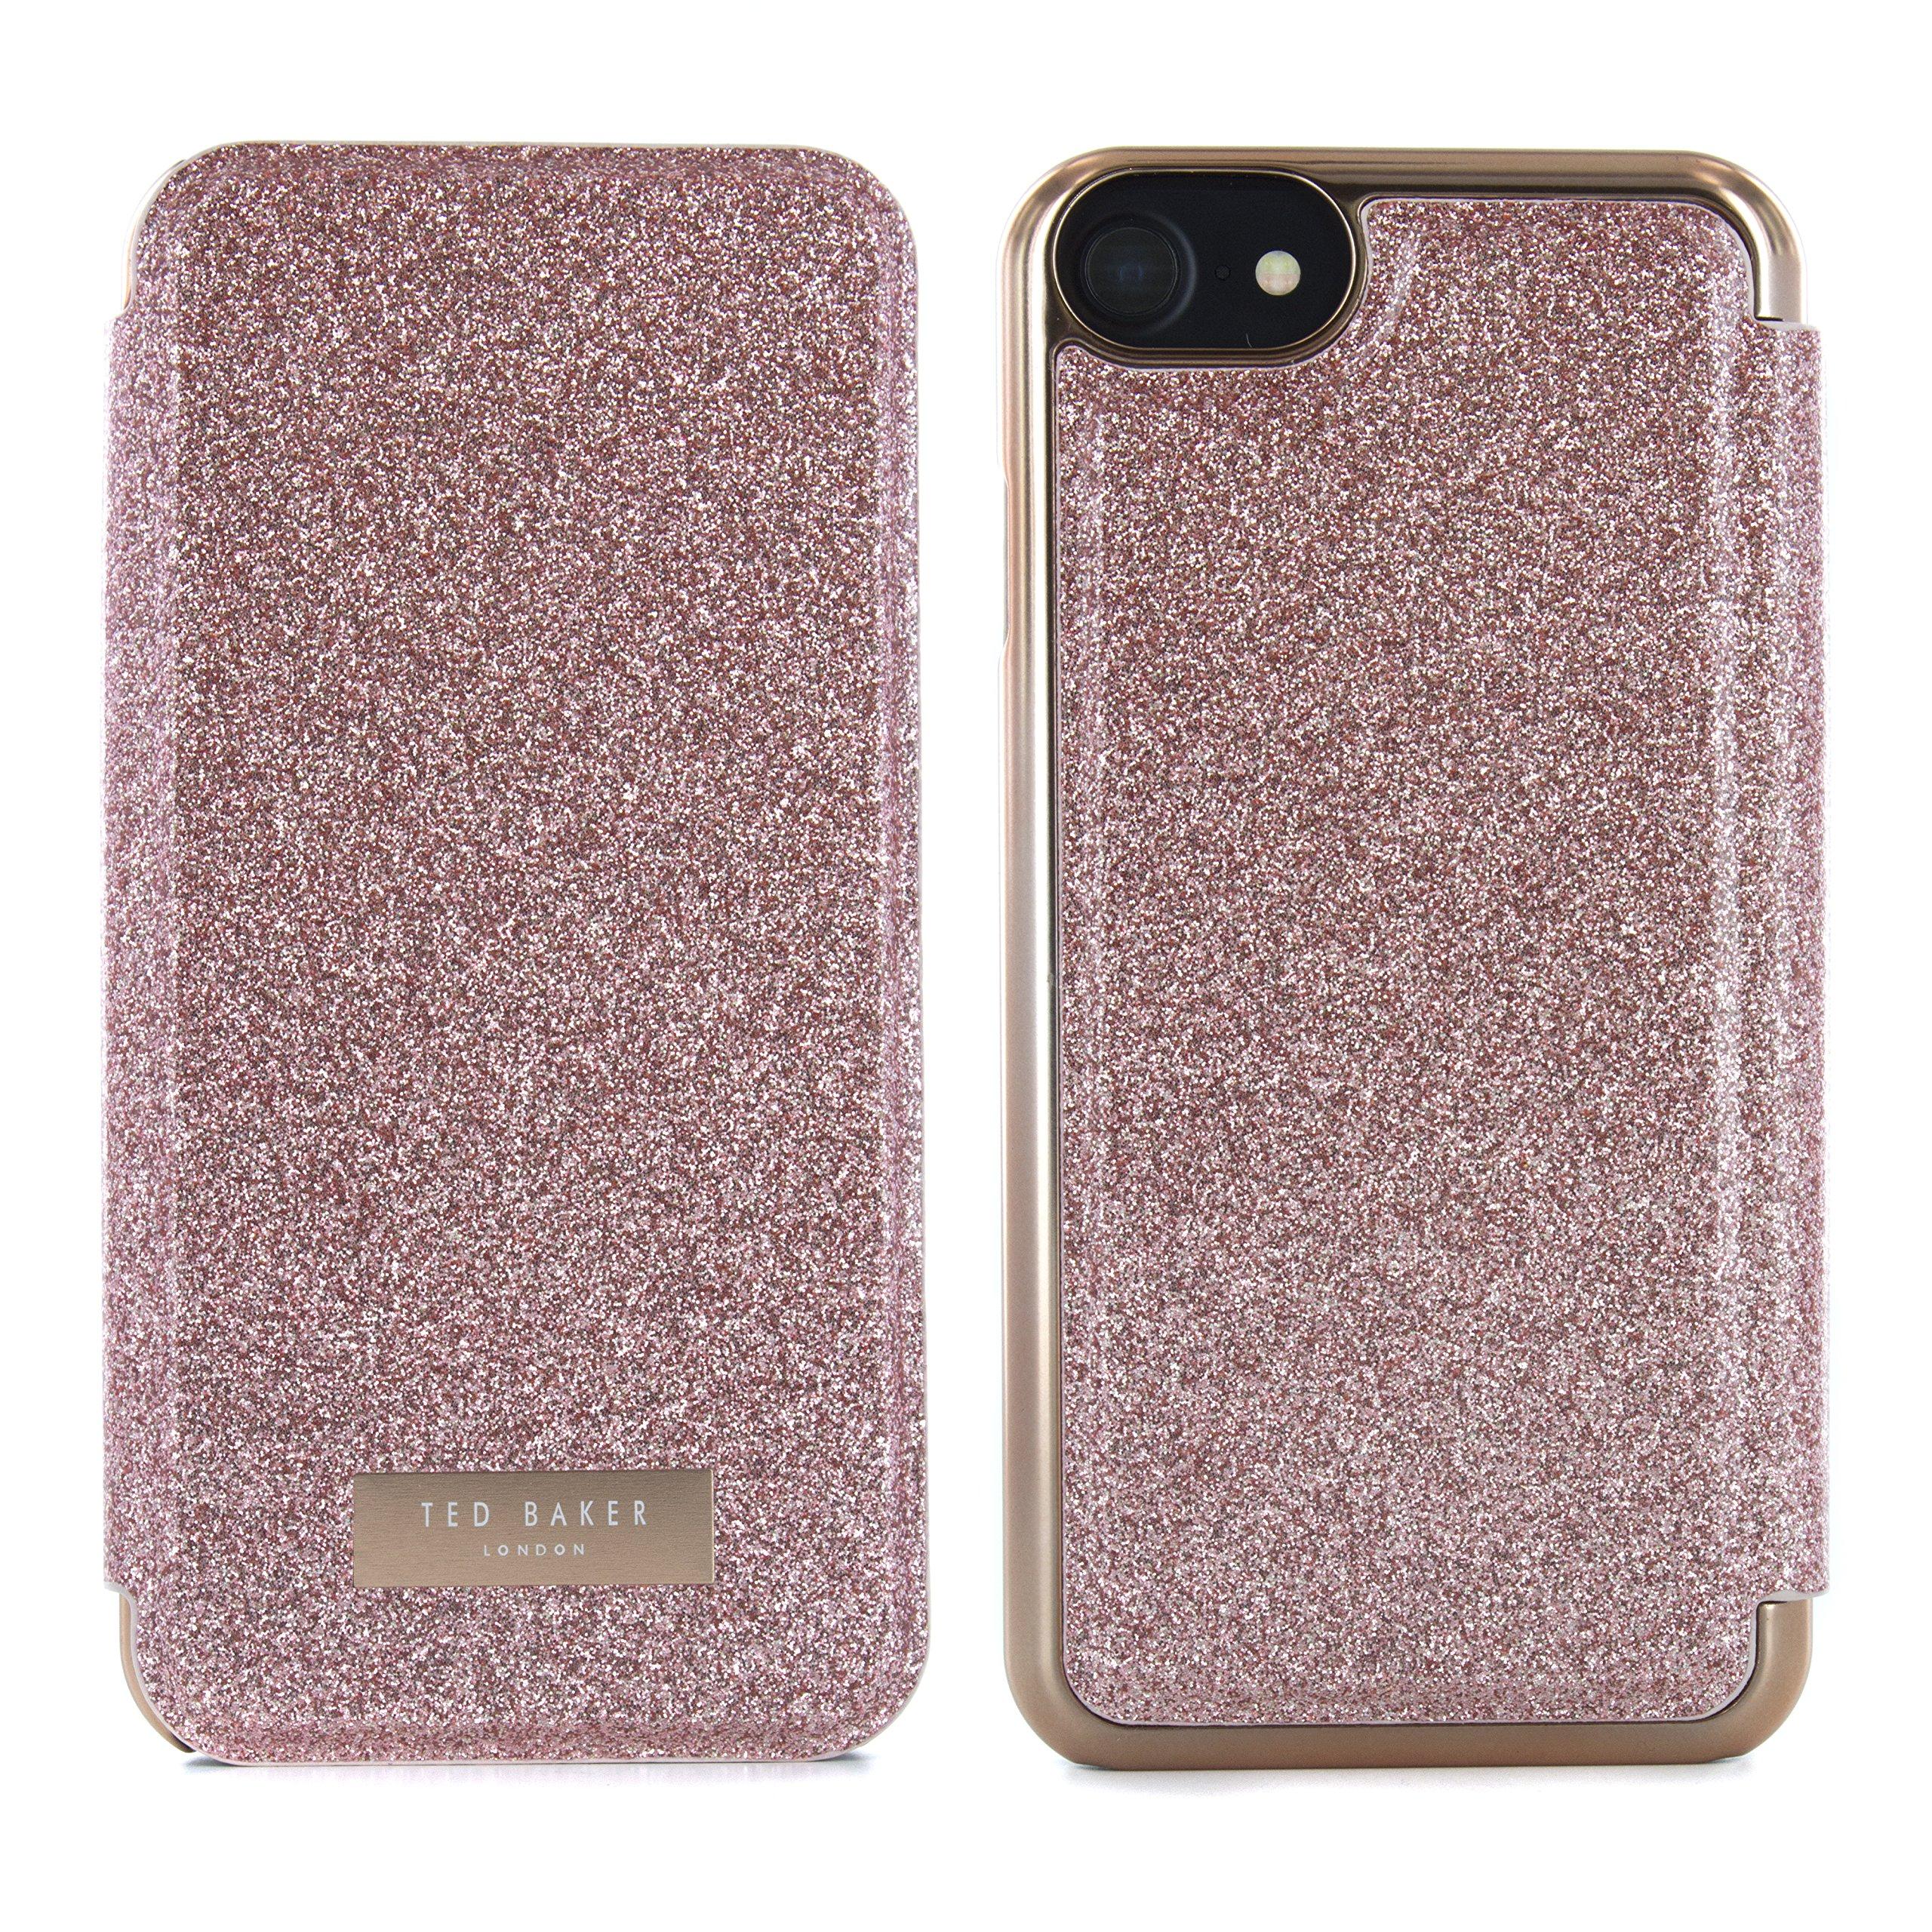 Oficiales de Ted Baker® SS17 Funda con Tapa para Apple iPhone 7 – glitsie – Oro Rosa: Amazon.es: Electrónica